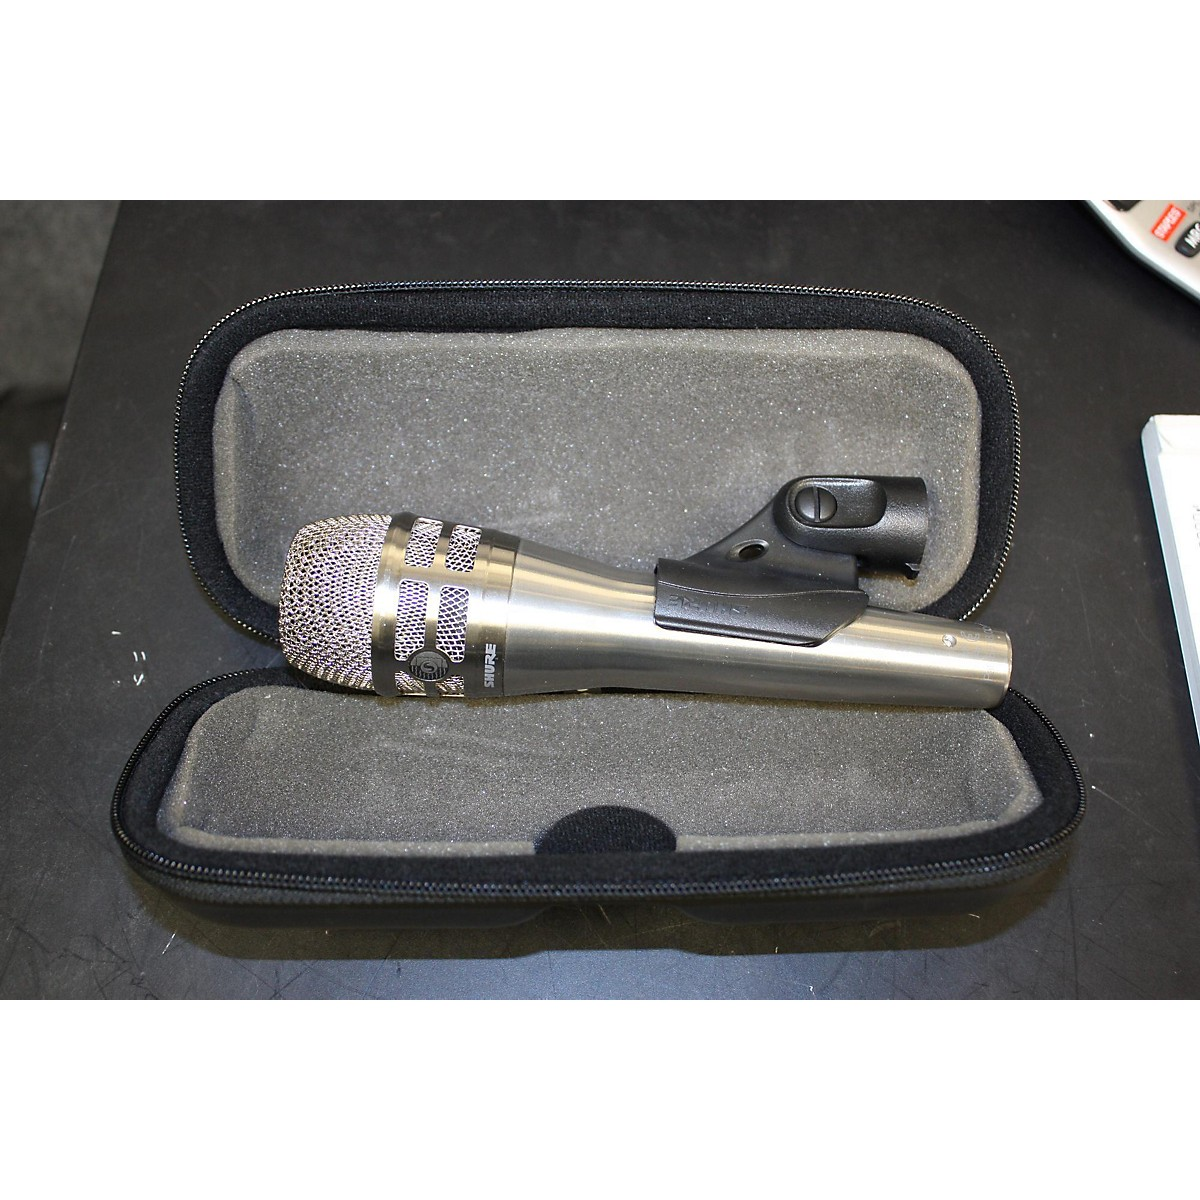 Shure KSM8 Dynamic Microphone